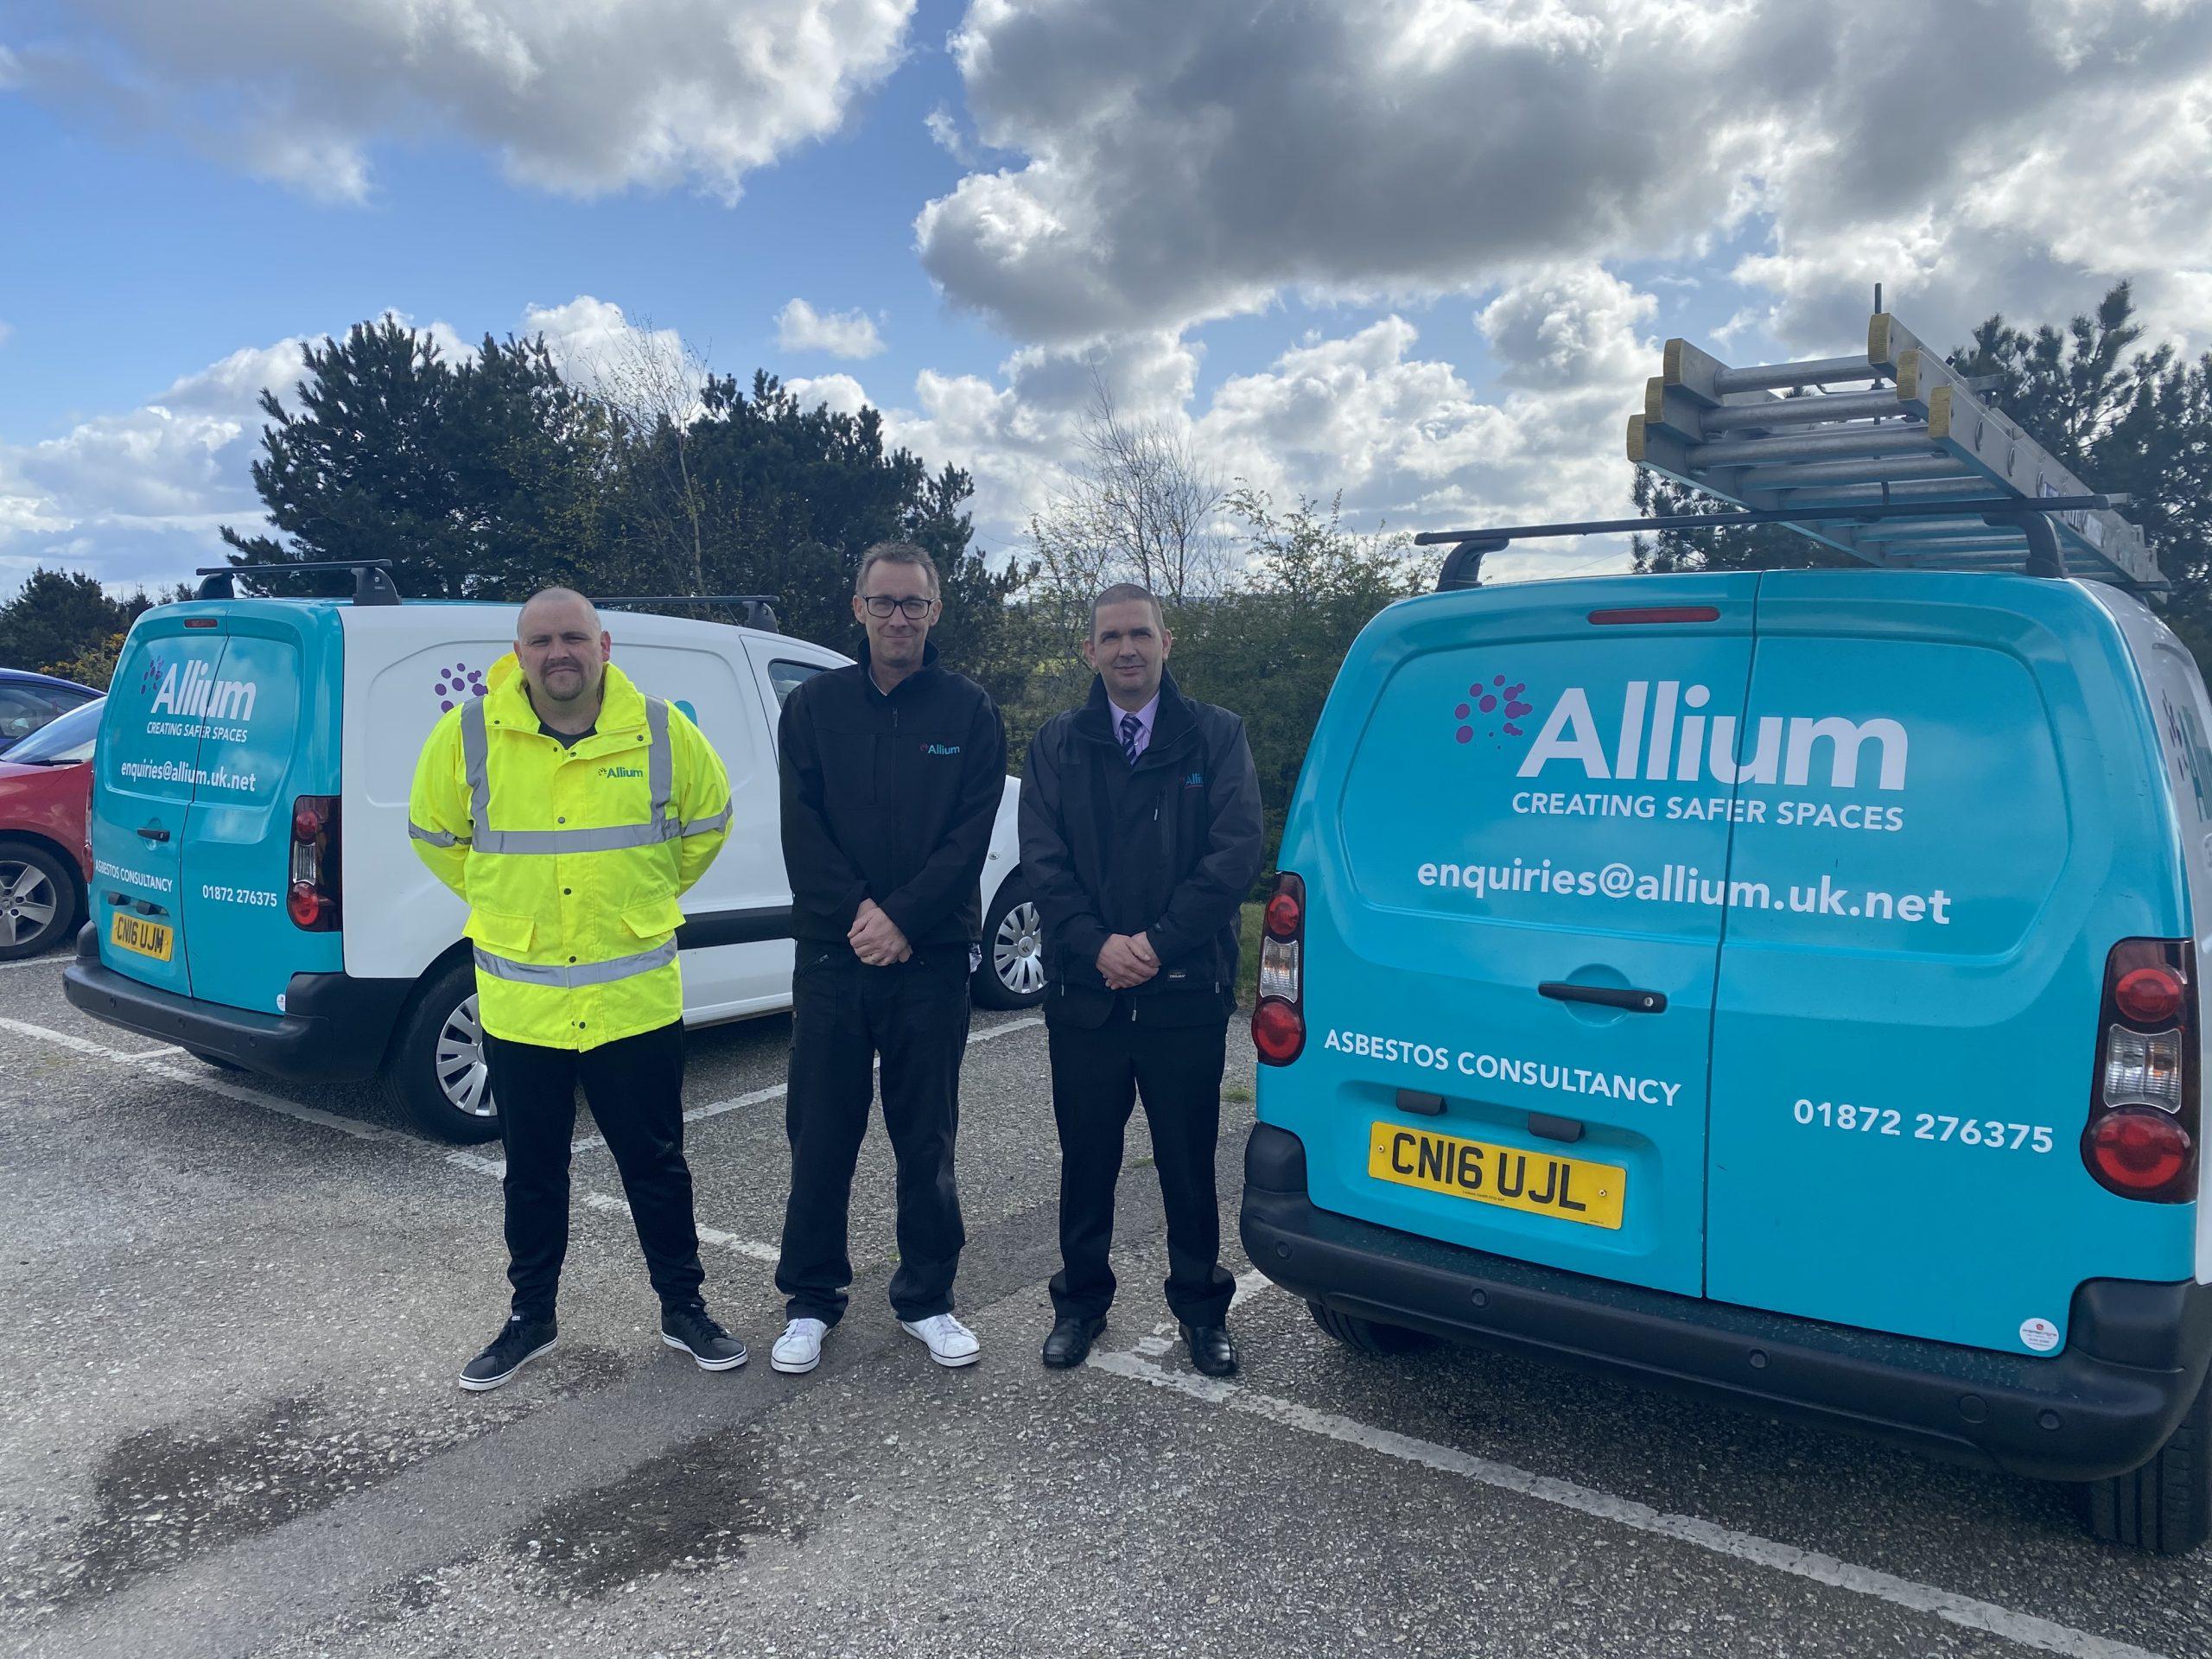 Asbestos Surveyors for Cornwall, Southampton and Yorkshire